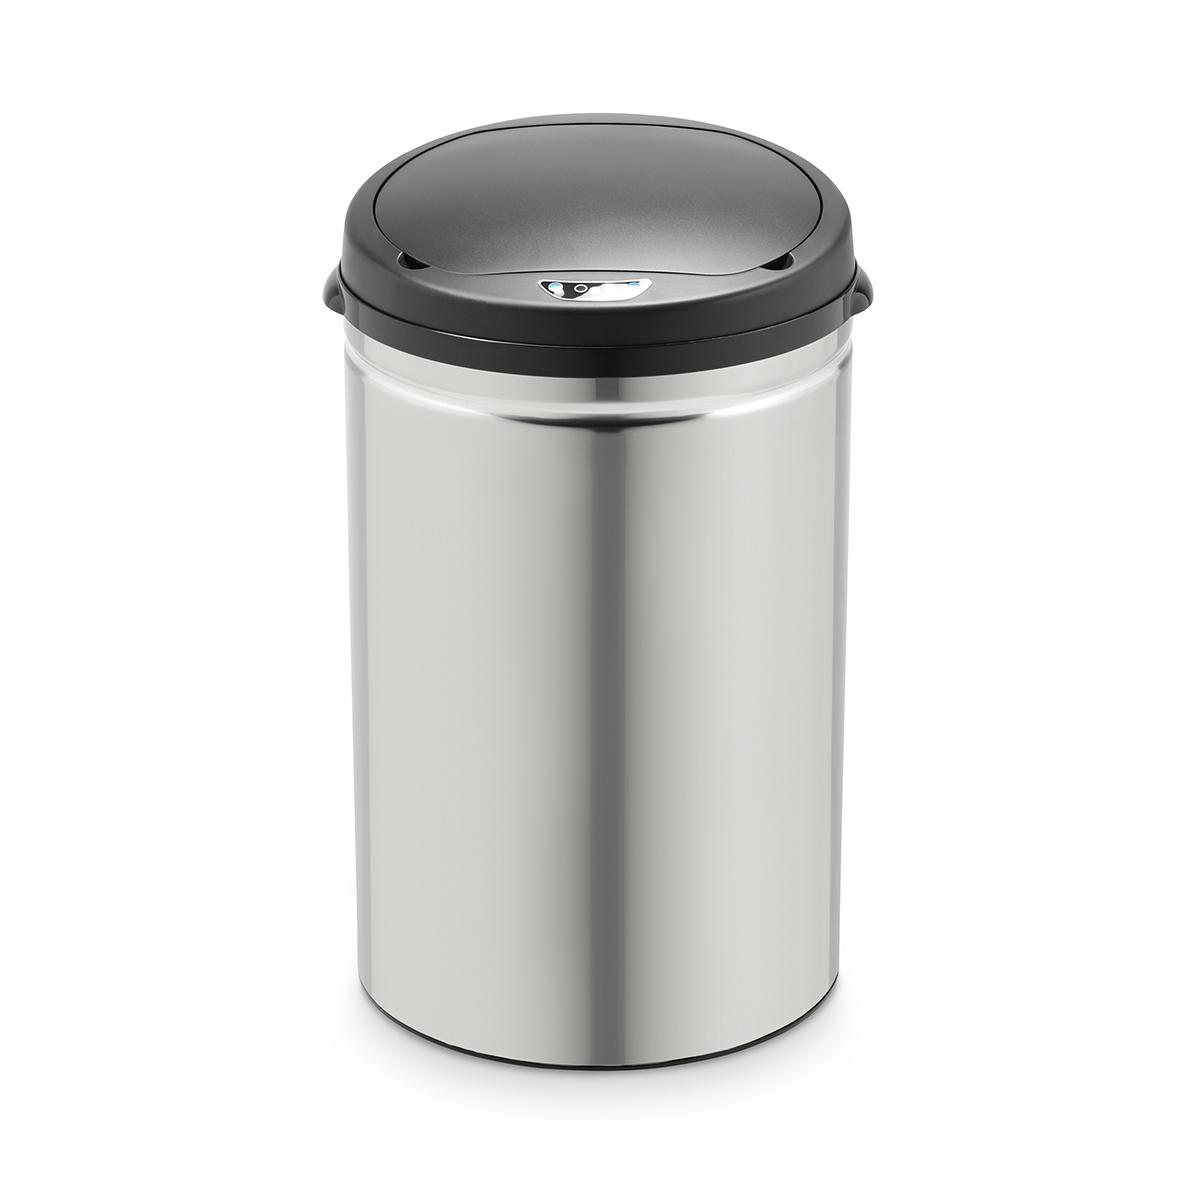 90730 SVITA Sensor-Mülleimer 30L Edelstahl Mülleimer mit Sensor Abfalleimer Küche